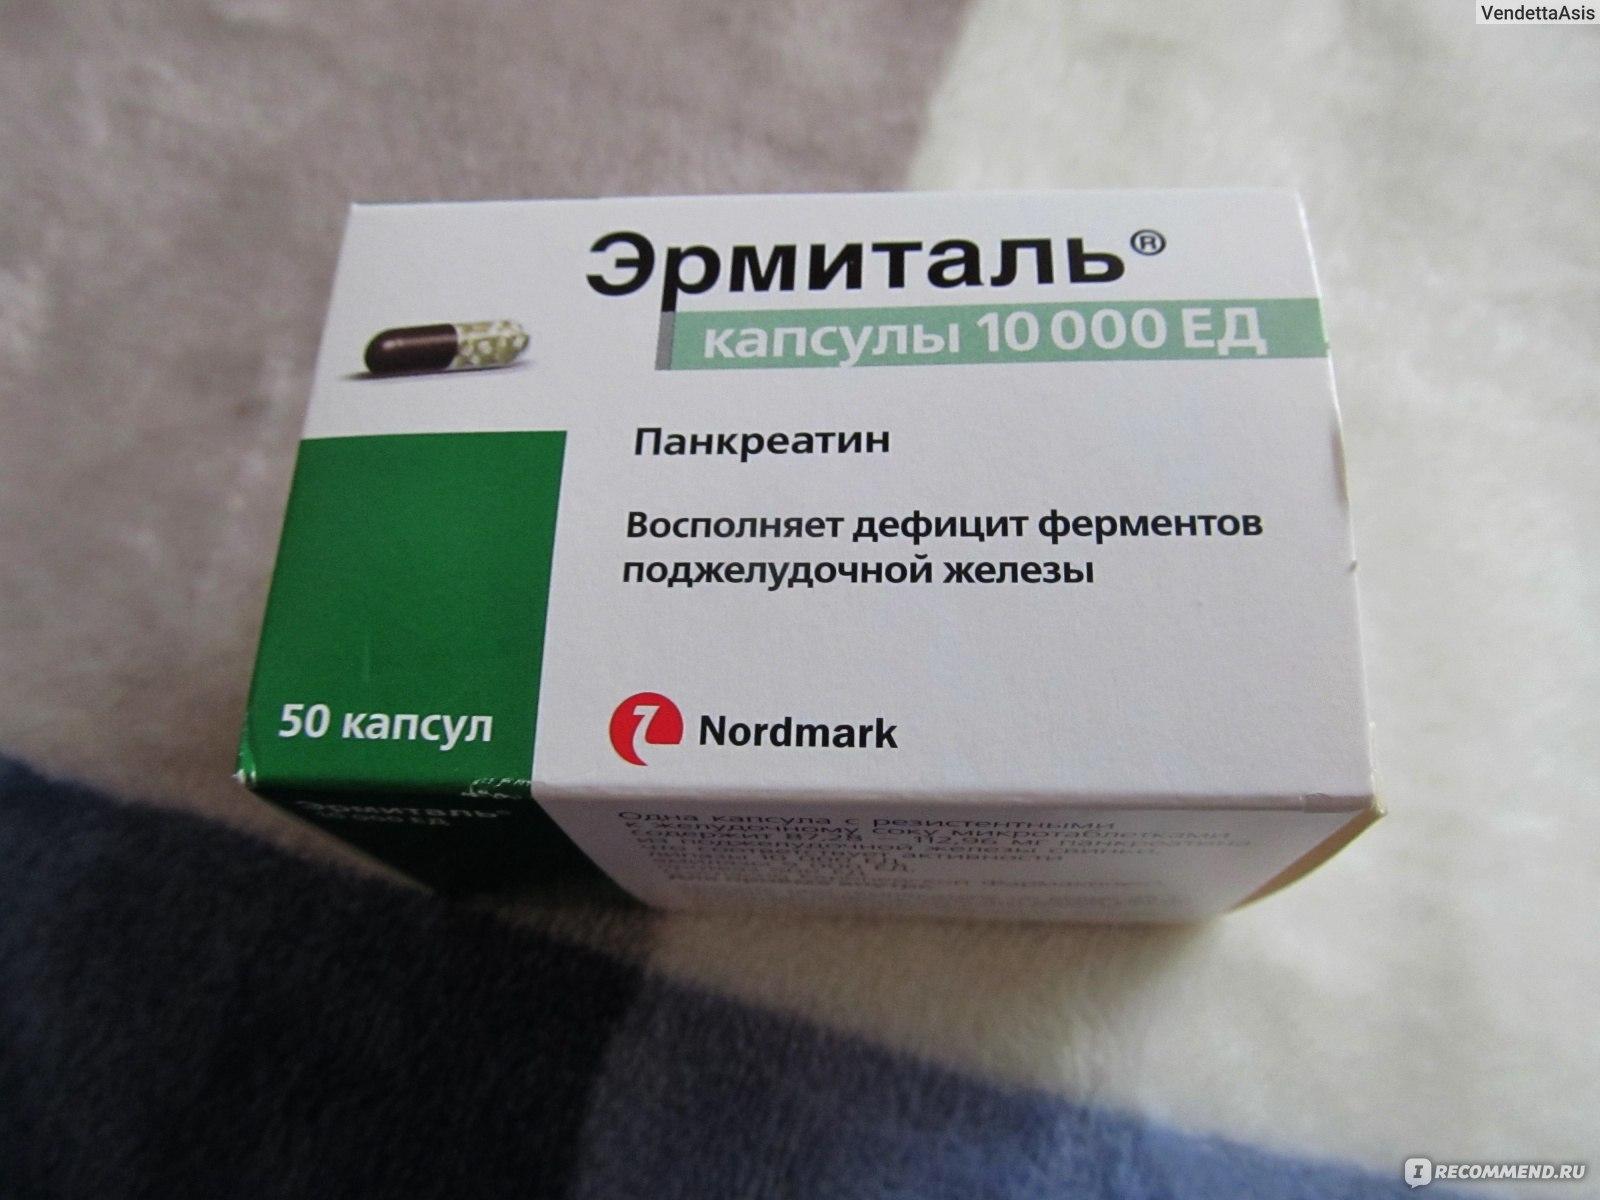 Эрмиталь: таблетки 10000 ед, 25000 ед и 36000 ед